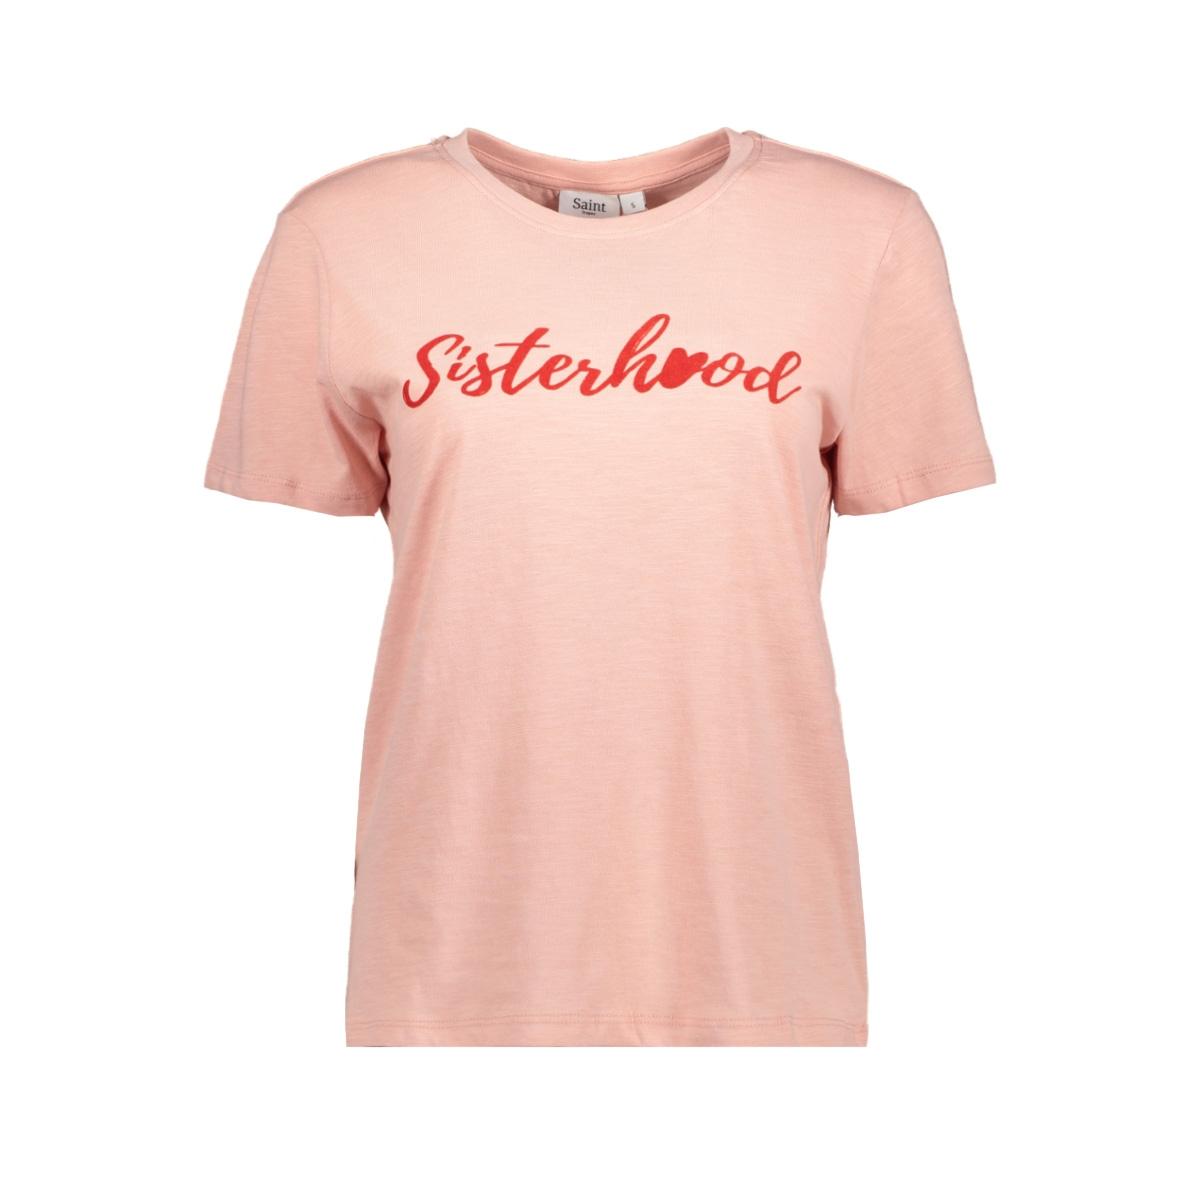 t shirt w flock print t1547 saint tropez t-shirt 3282